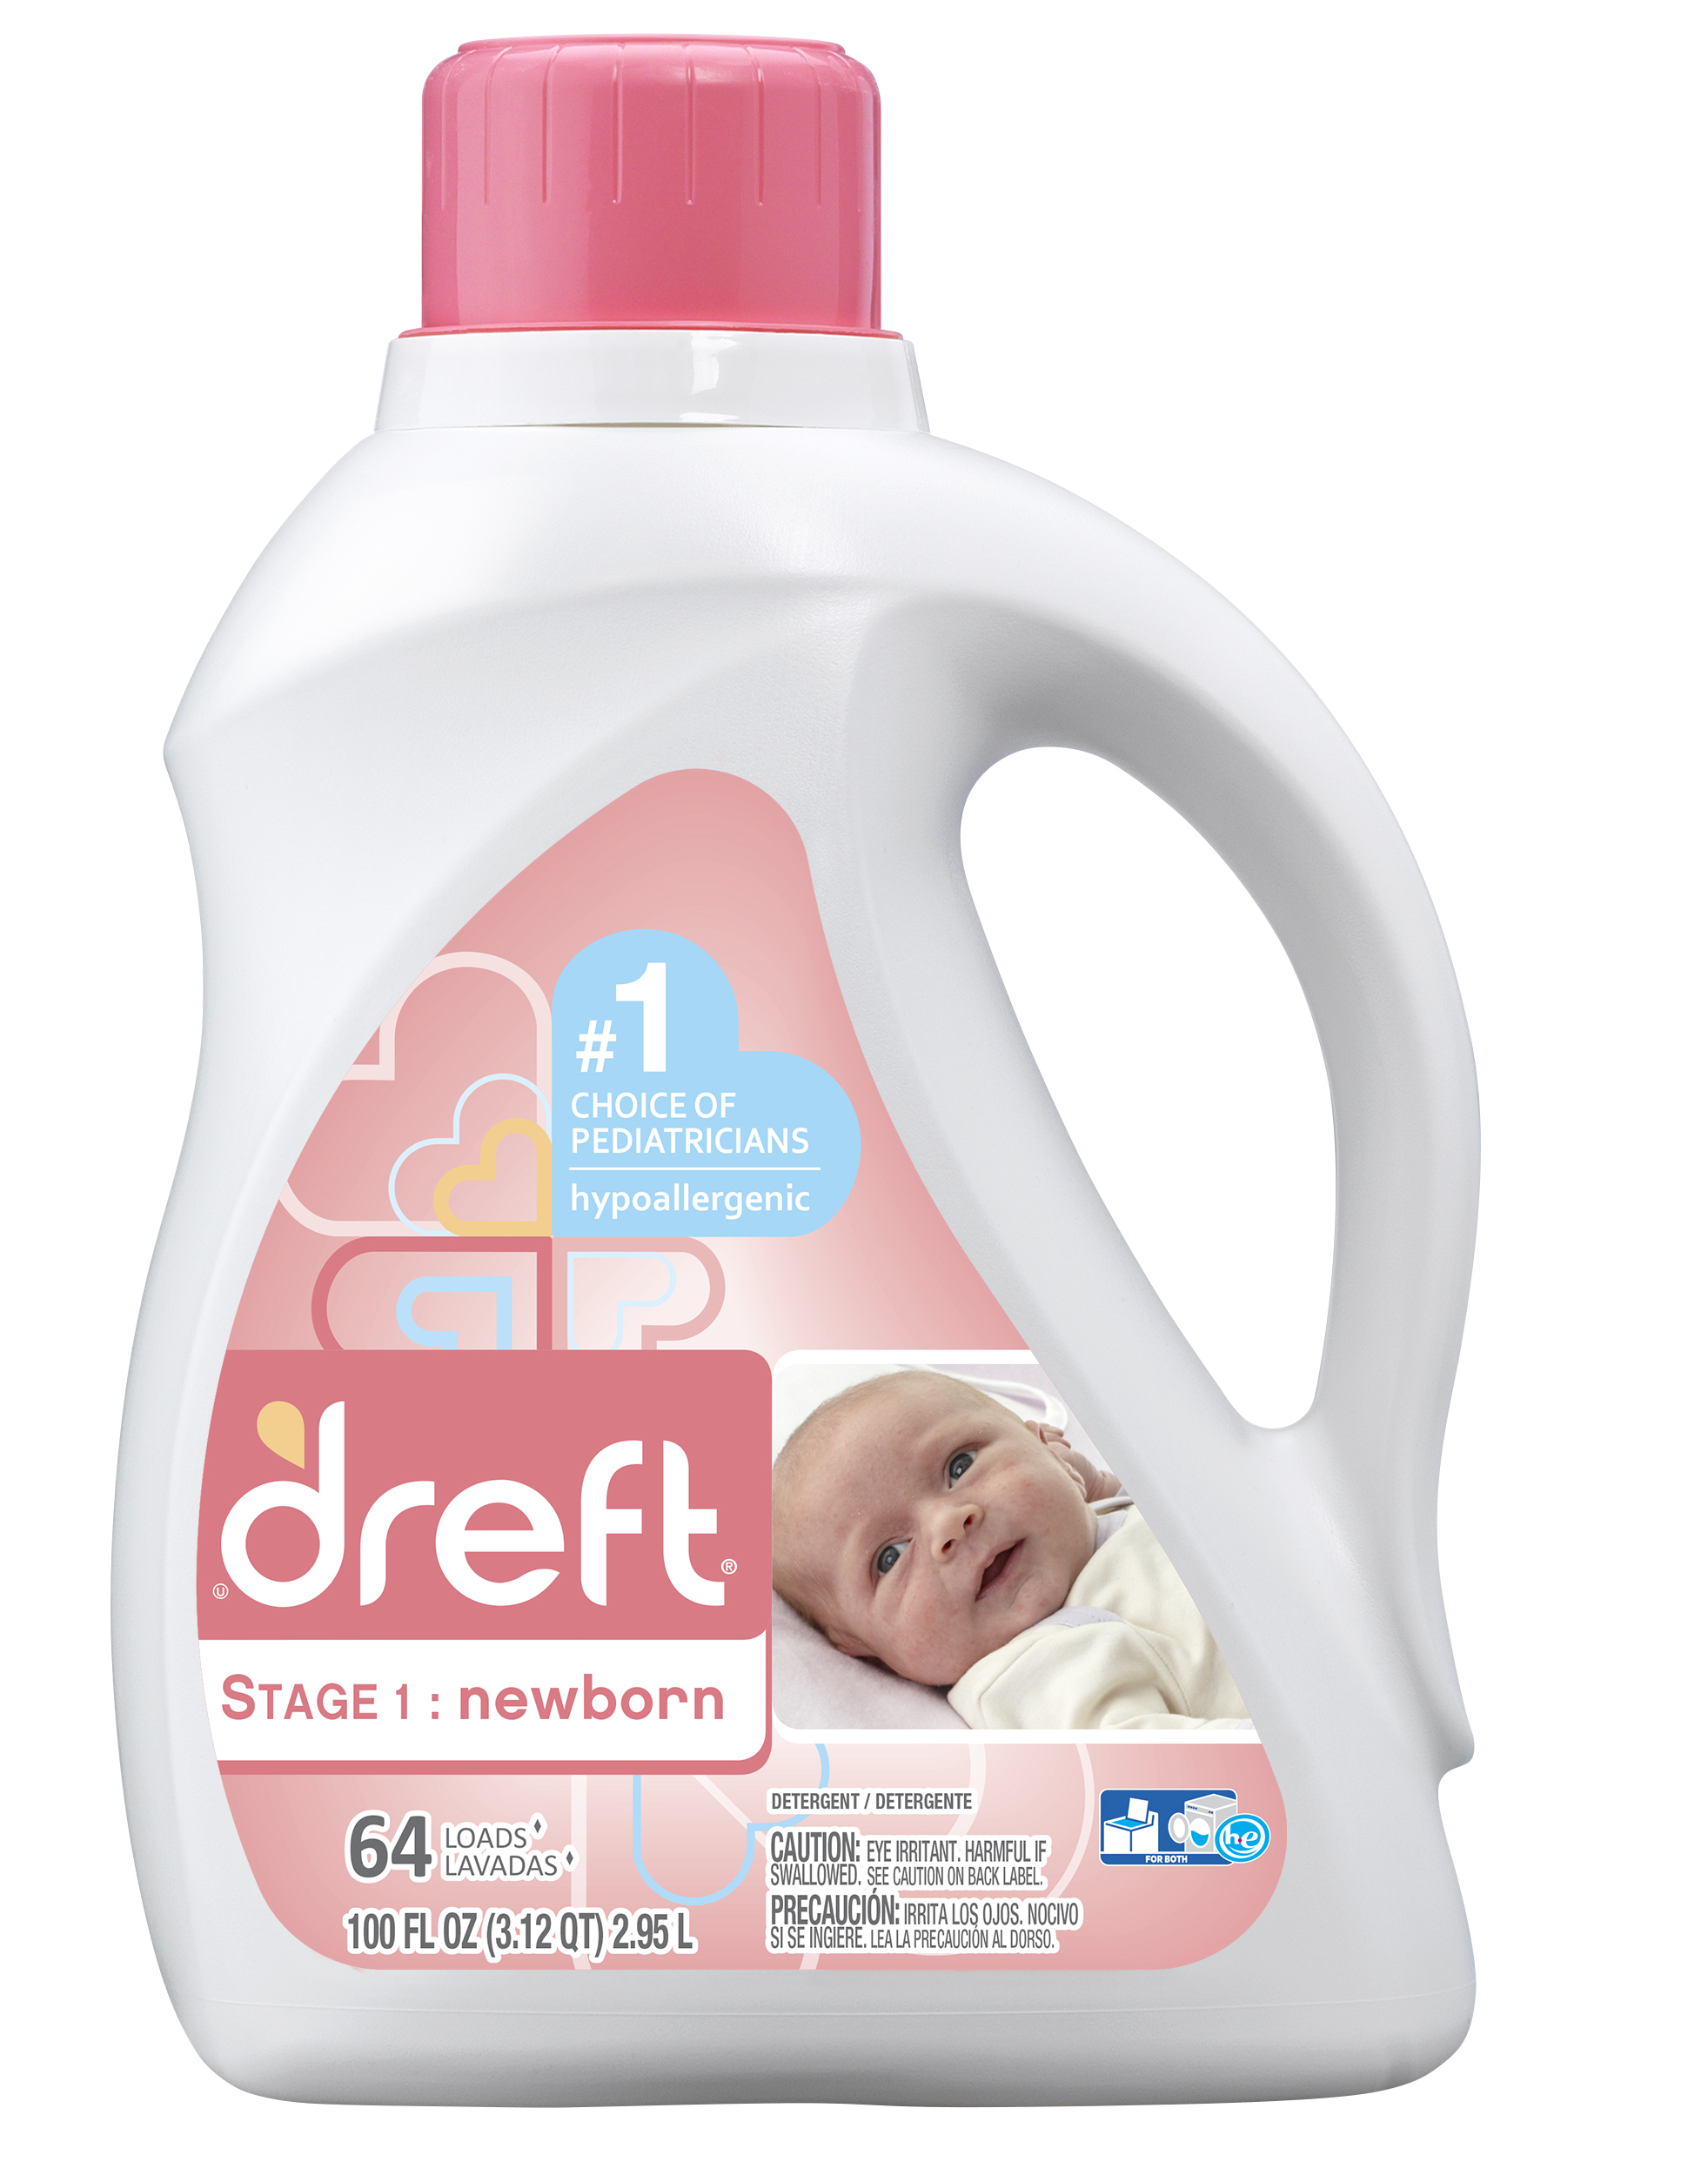 Dreft Makes Doing Laundry Amazing Giveaway